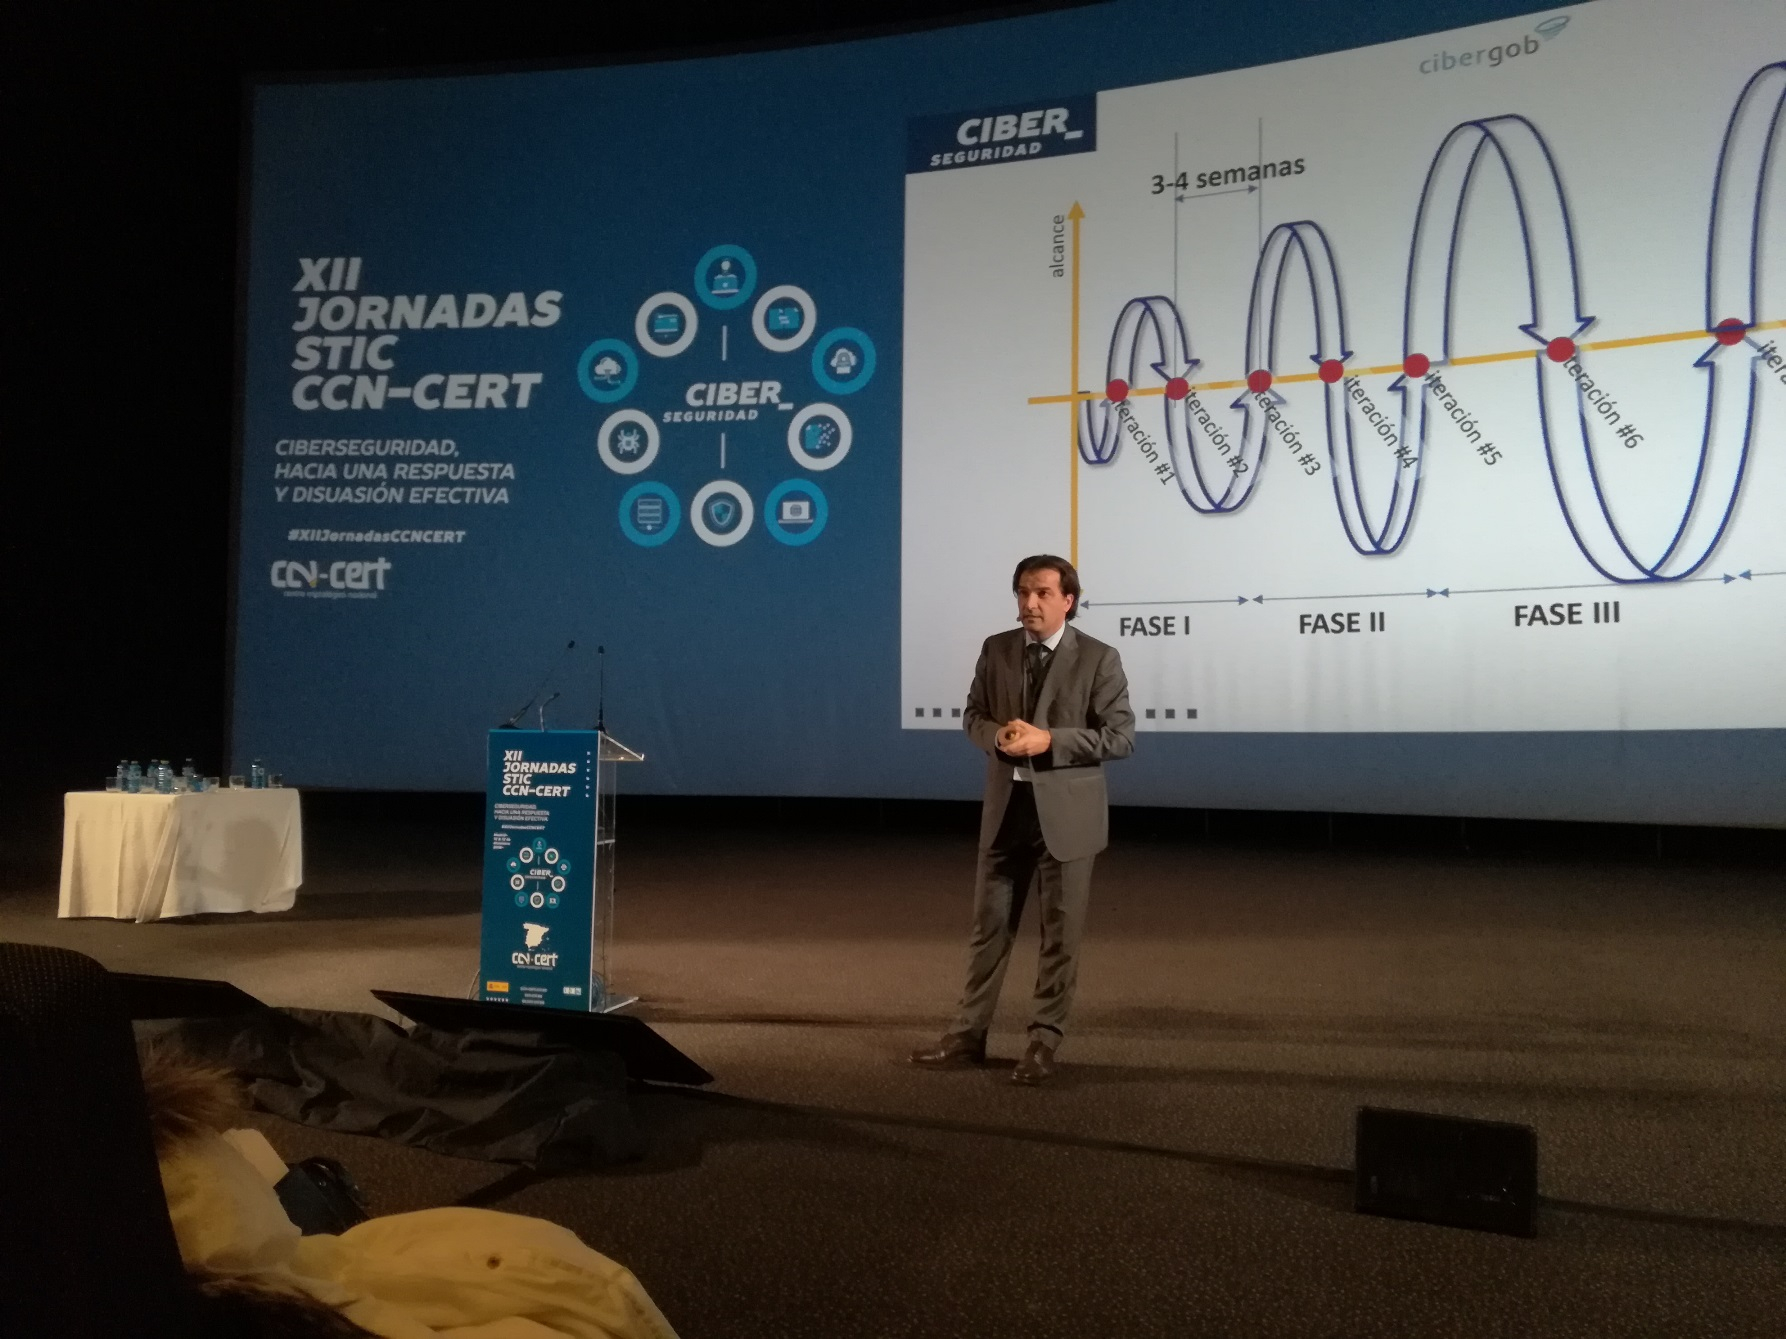 CiberGob jornadas CCN-CERT